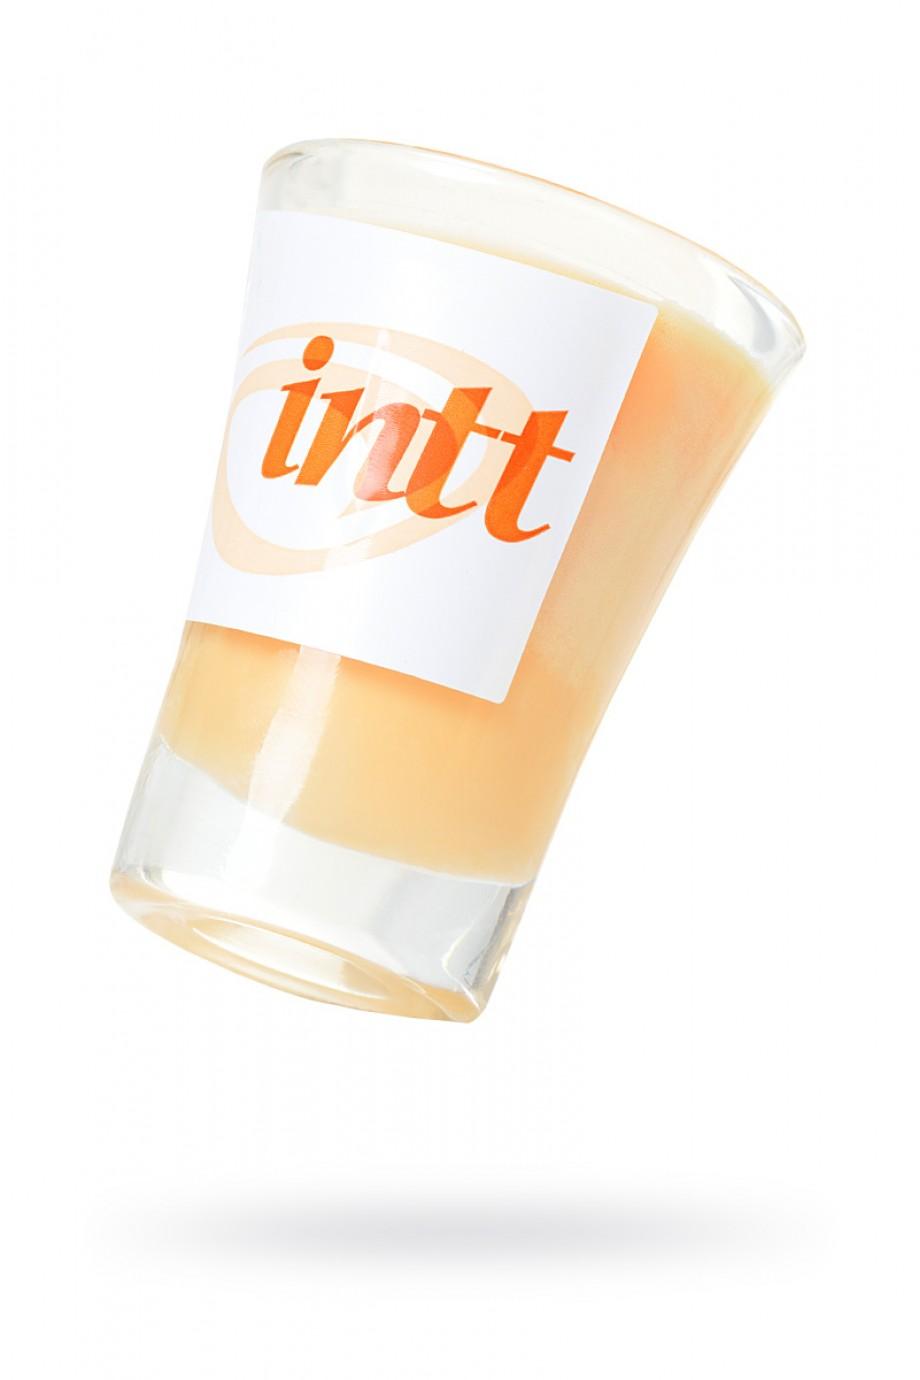 Массажная свеча для поцелуев INTT Peach с ароматом персика, 30 мл